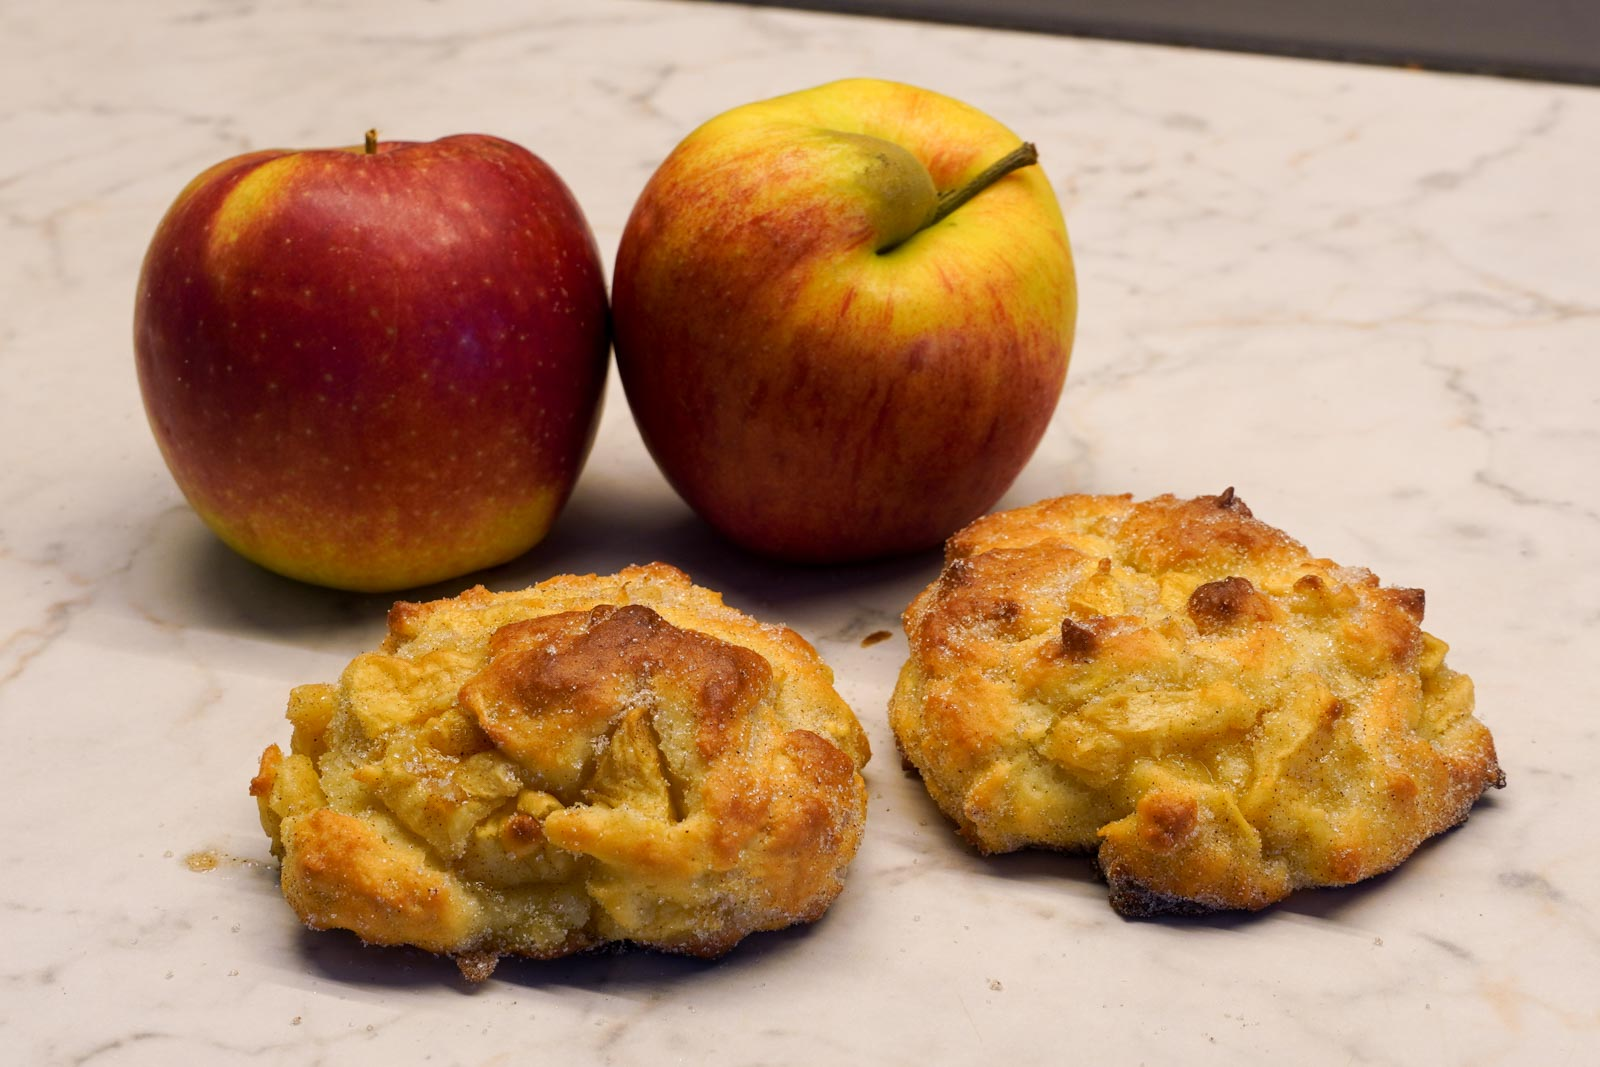 Thumbnail-Apfel-Zimt-Ballen